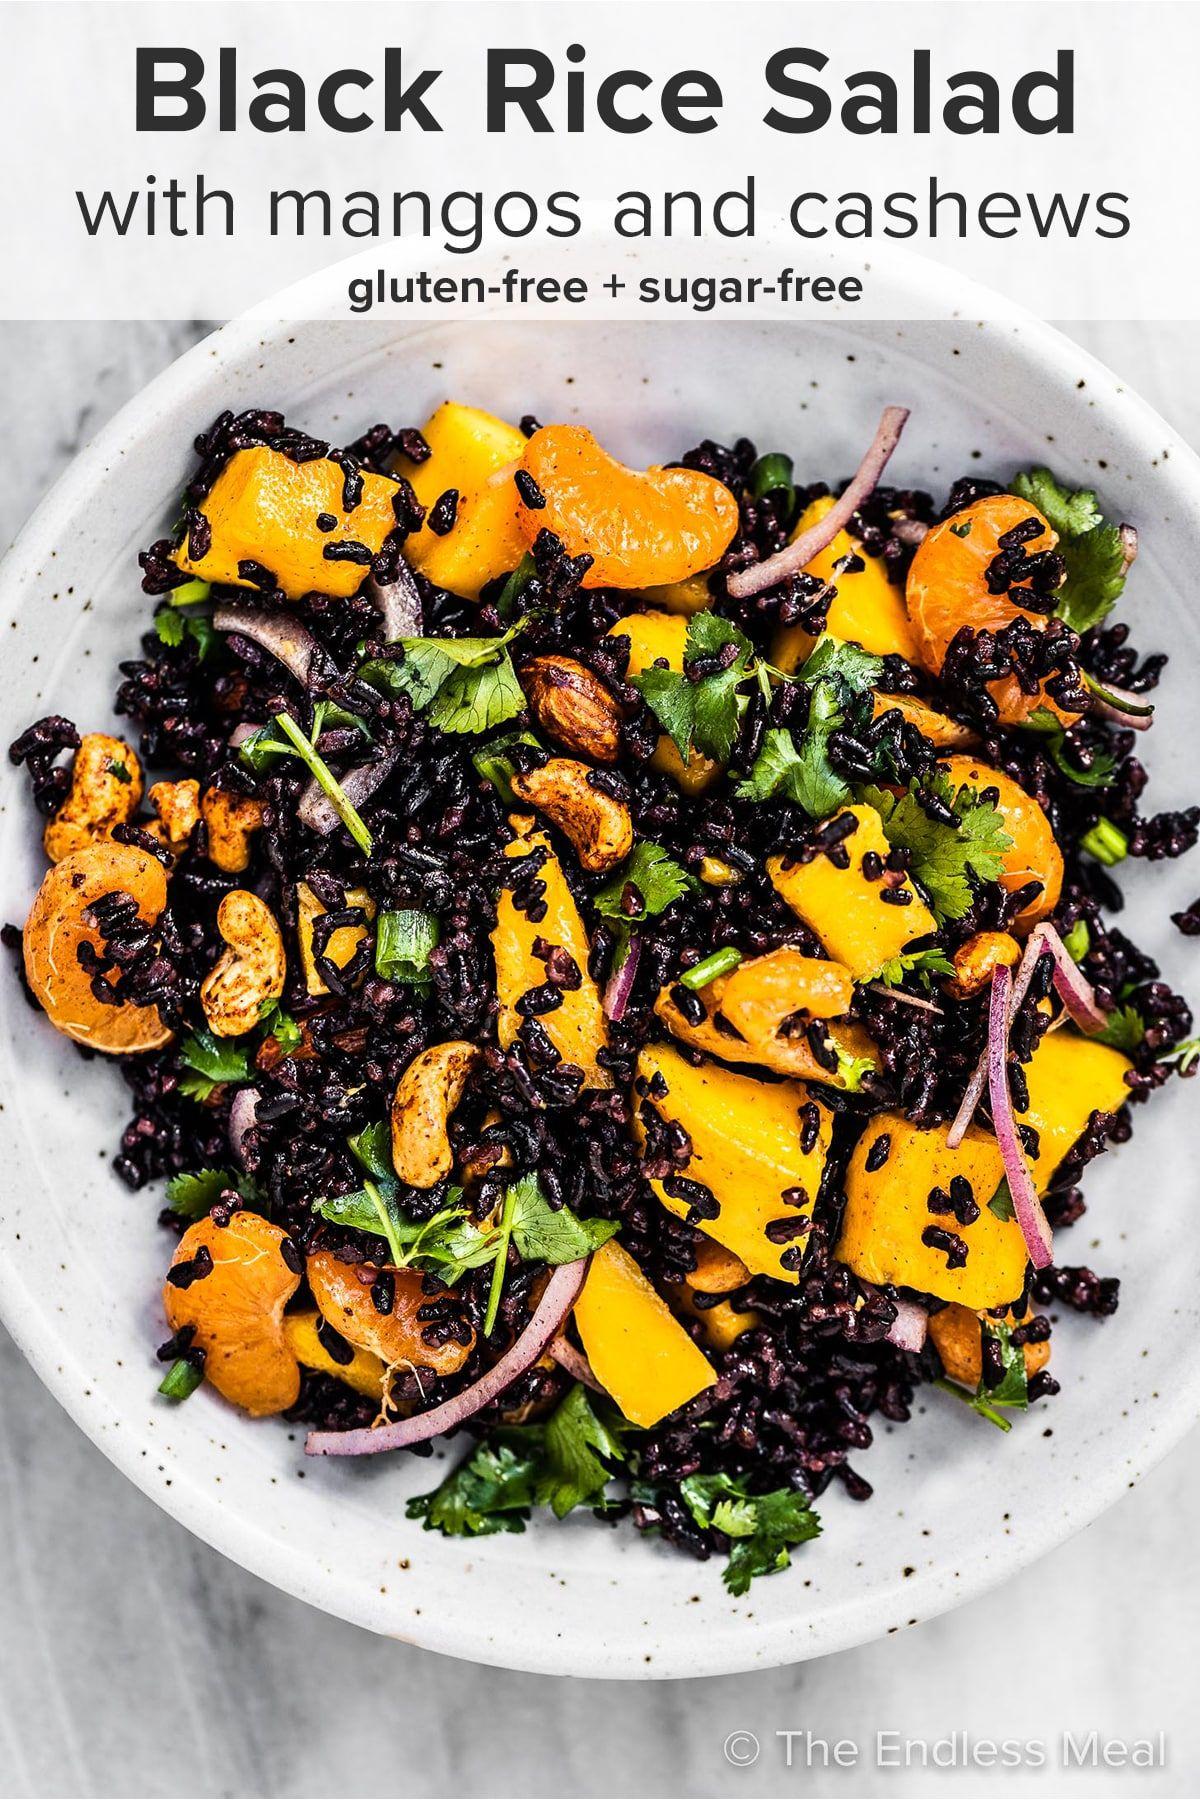 Black Rice Salad With Mango And Peanuts Recipe Black Rice Salad Rice Salad Orange Vinaigrette Recipes